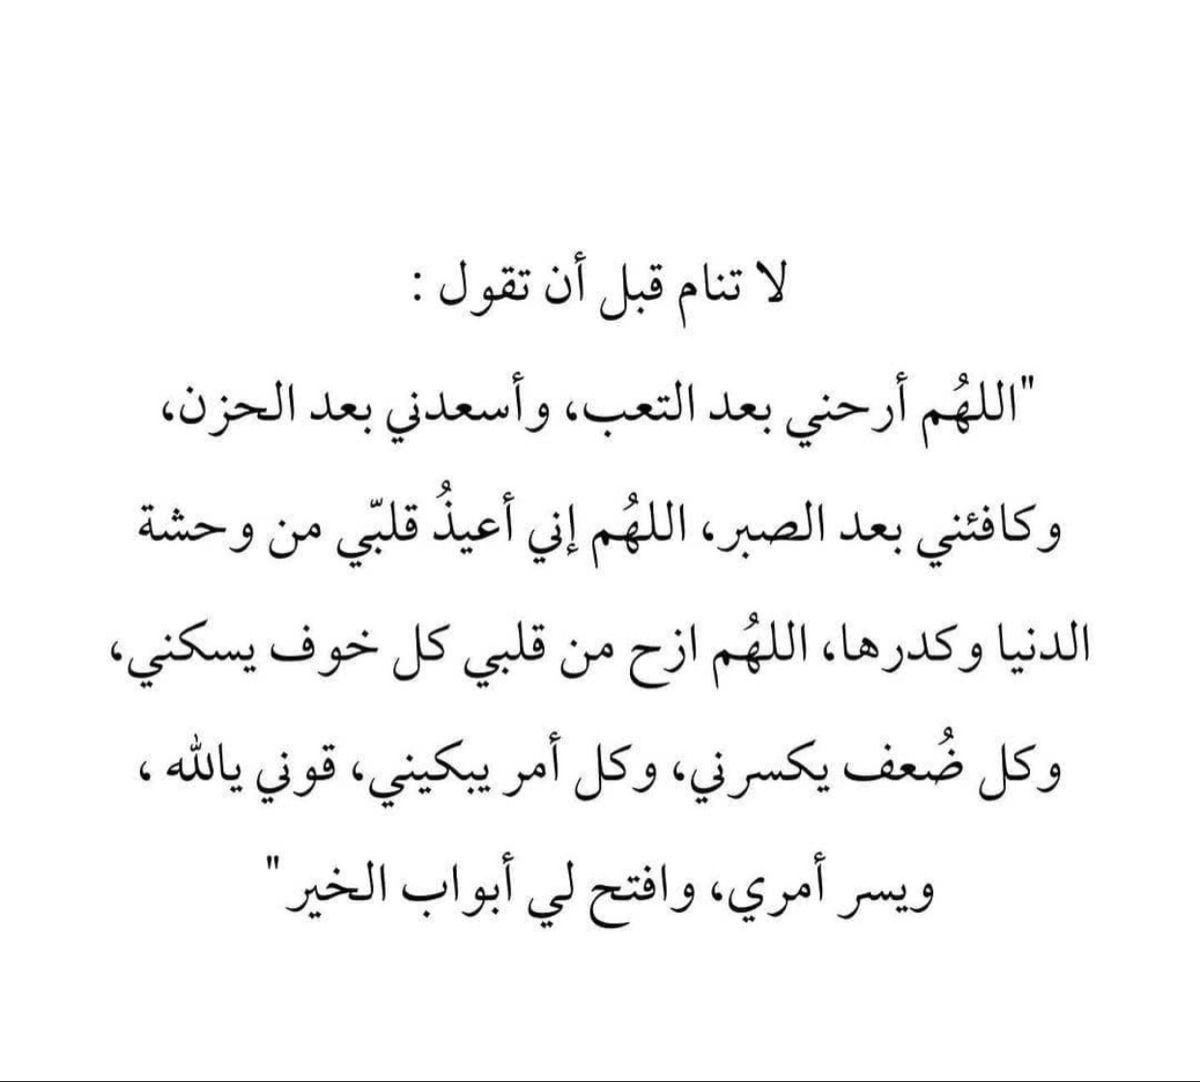 Pin By H On دعاء Arabic Arabic Calligraphy Calligraphy